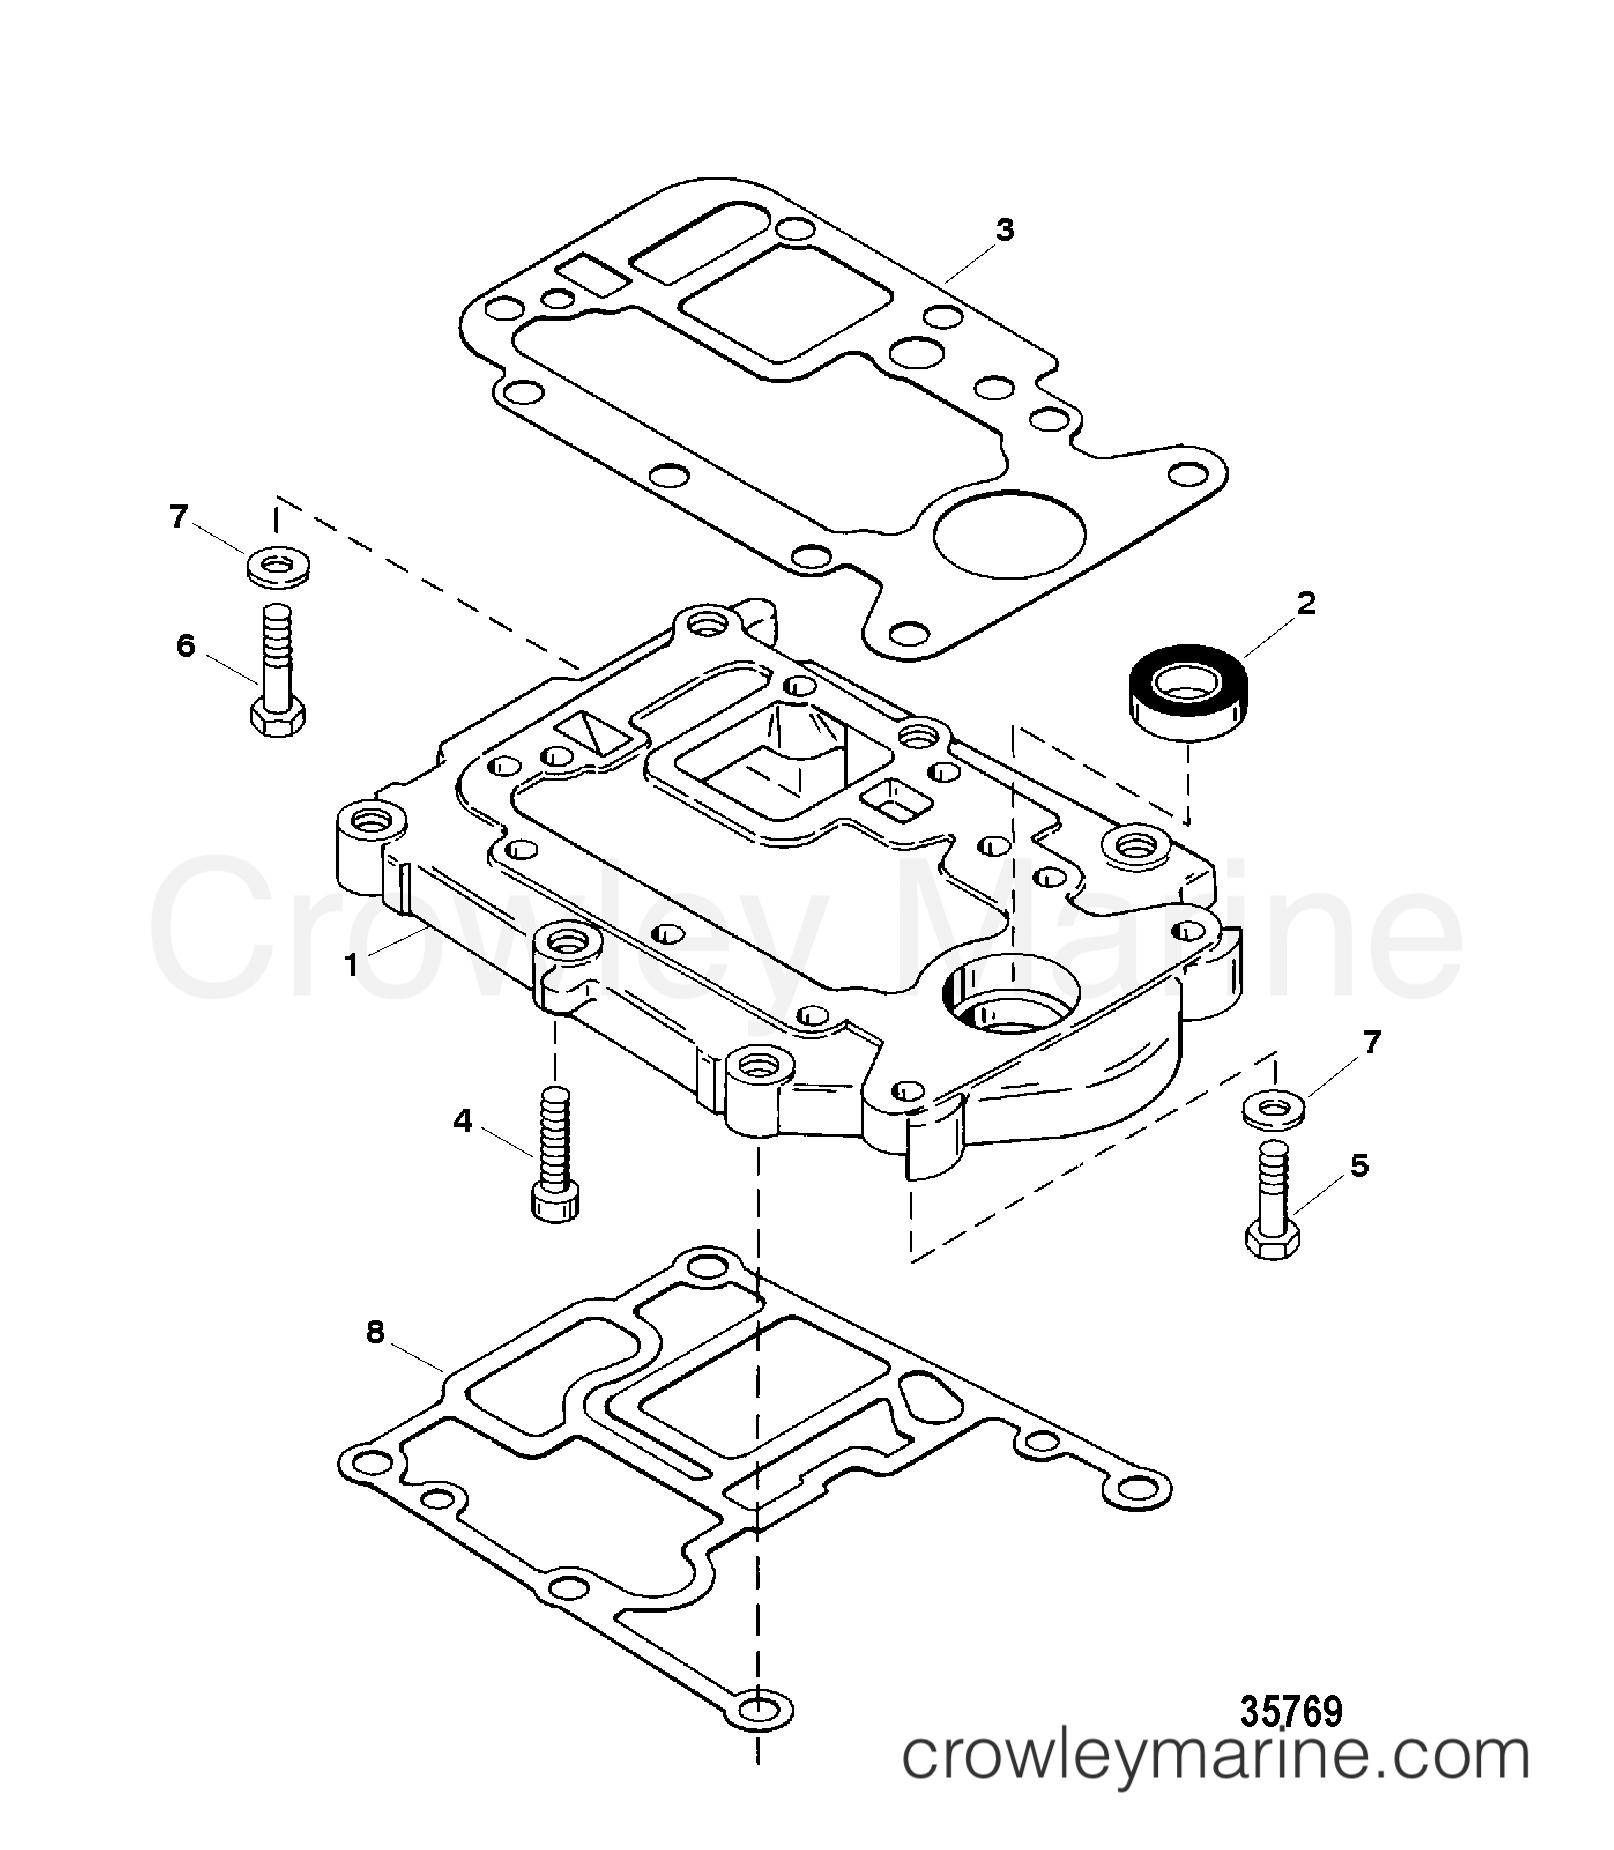 Adaptor Plate Upper